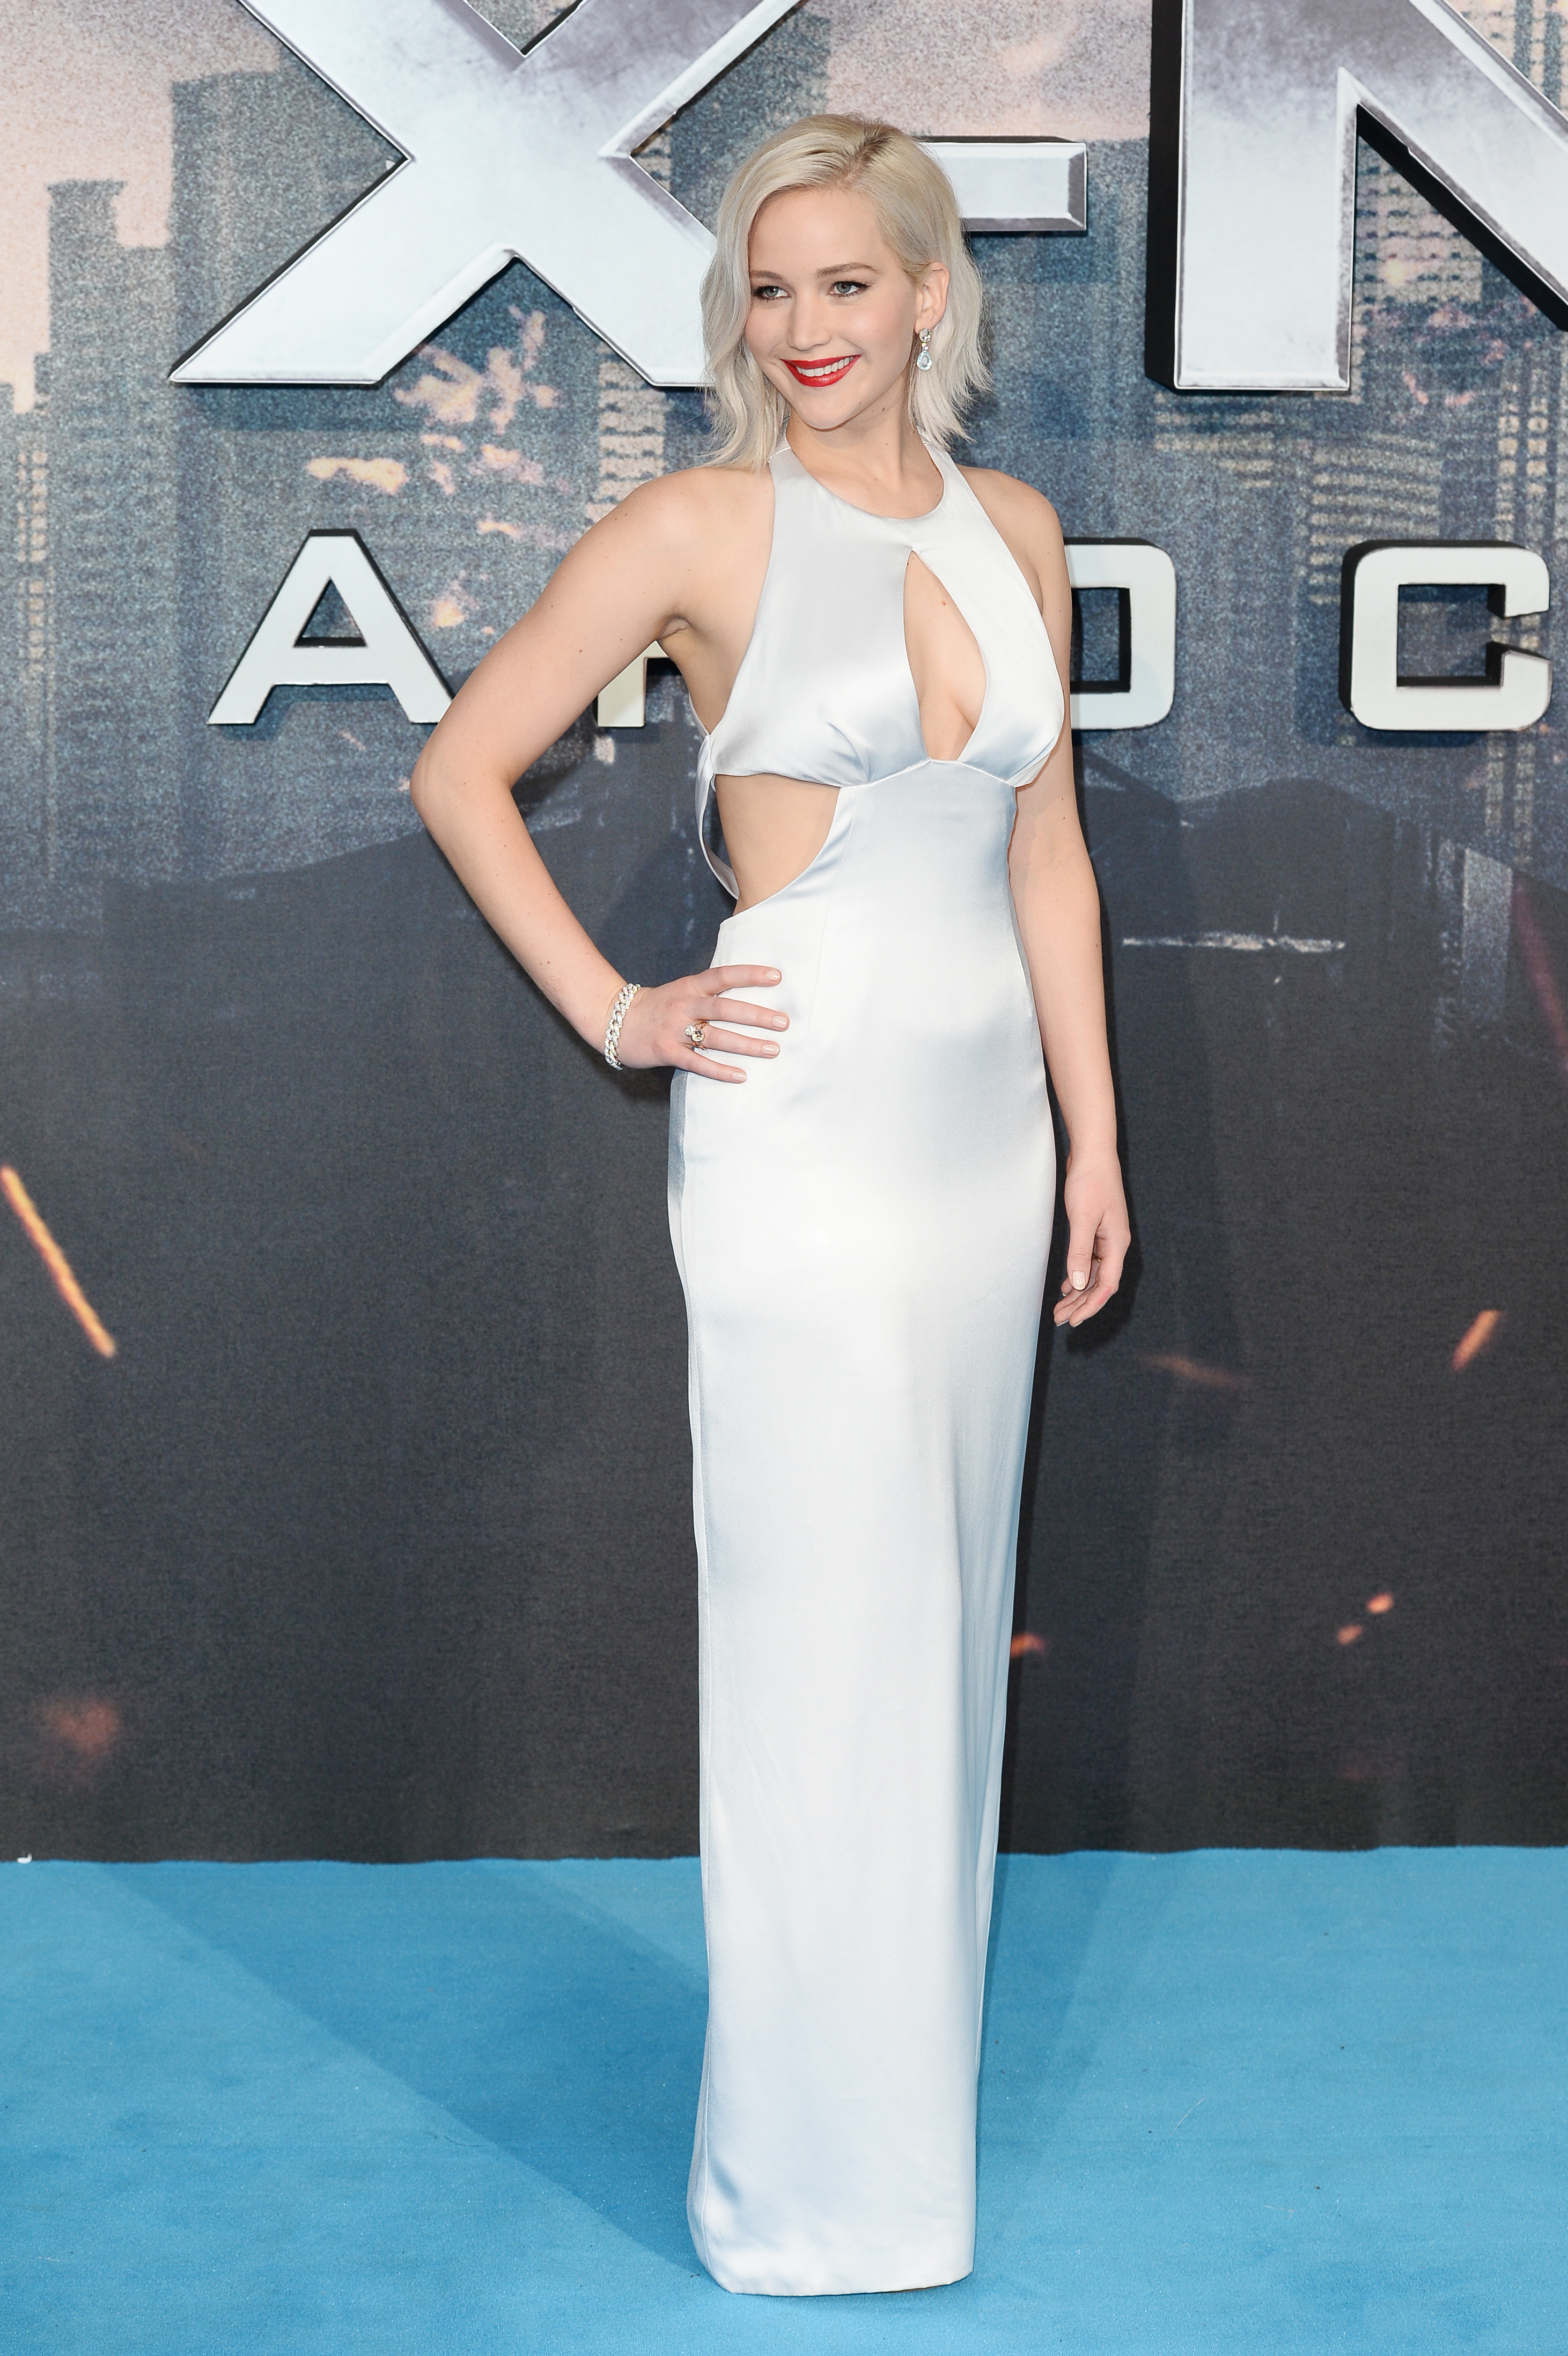 Jennifer Lawrence (Photo by Samir Hussein/WireImage)